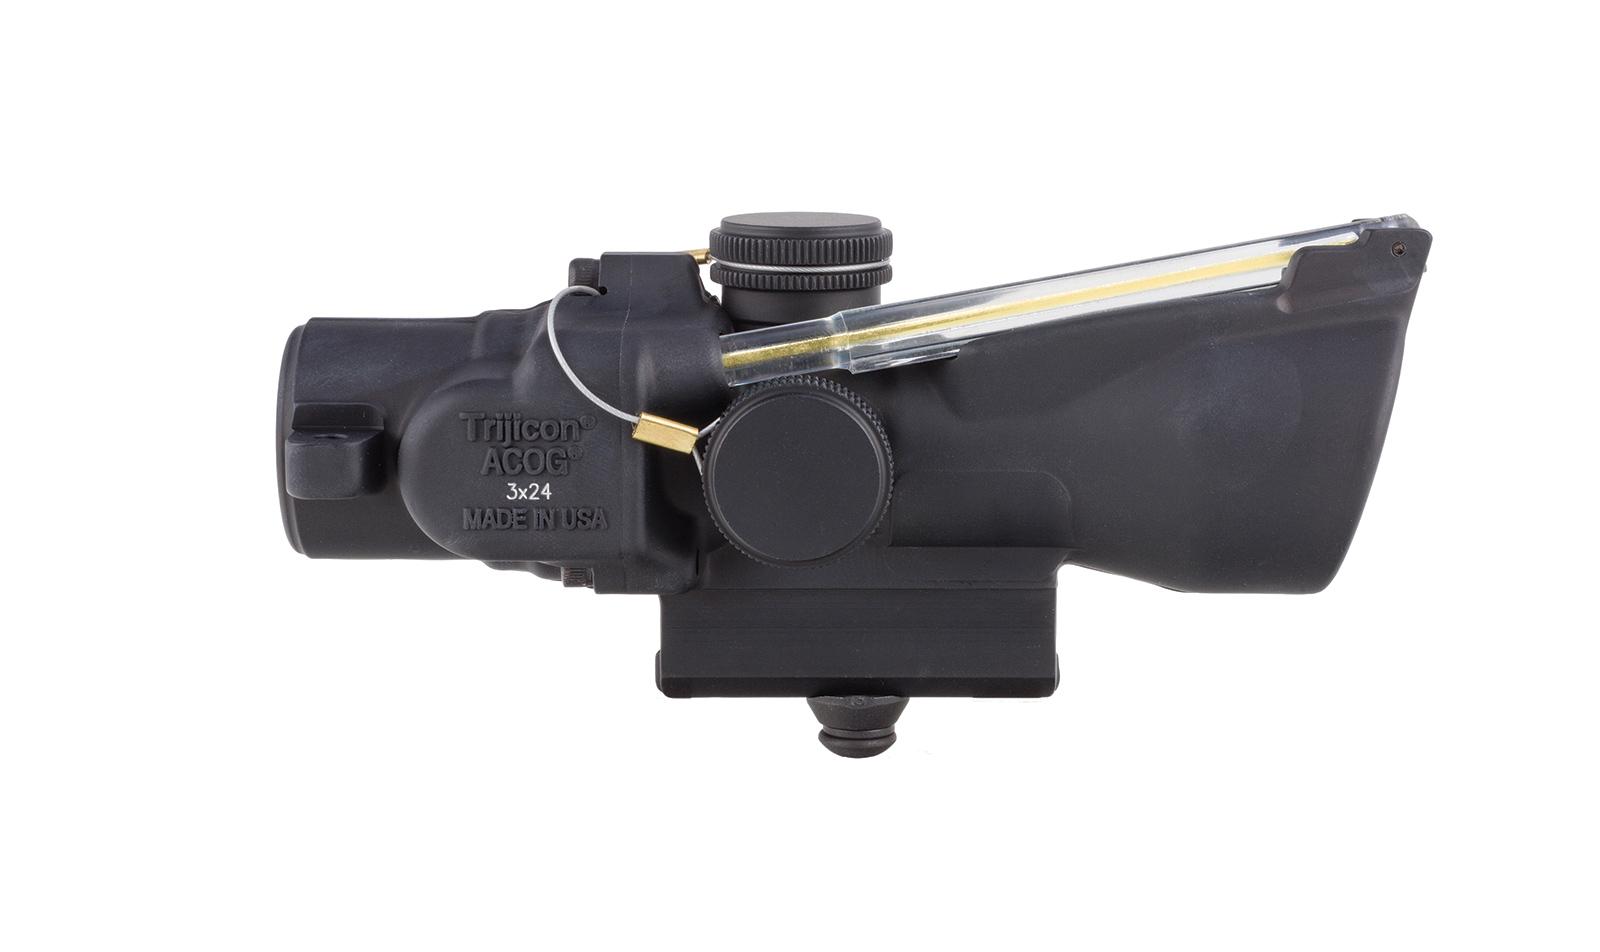 TA50-C-400224 angle 6